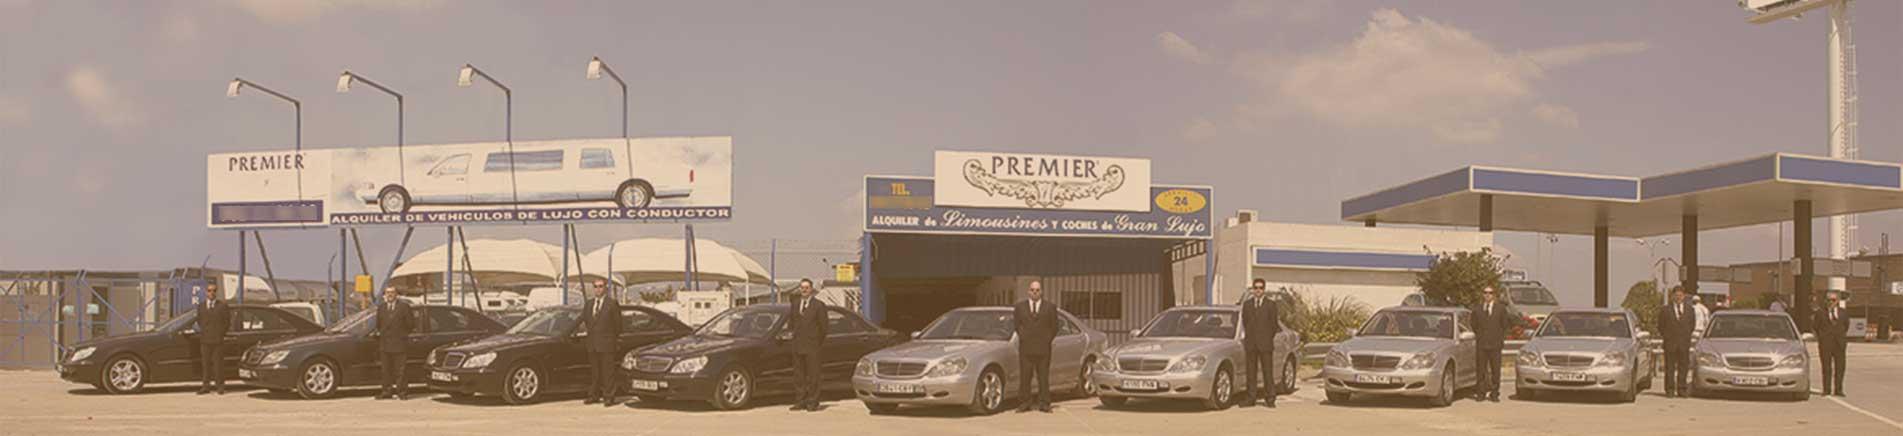 fleet limousines